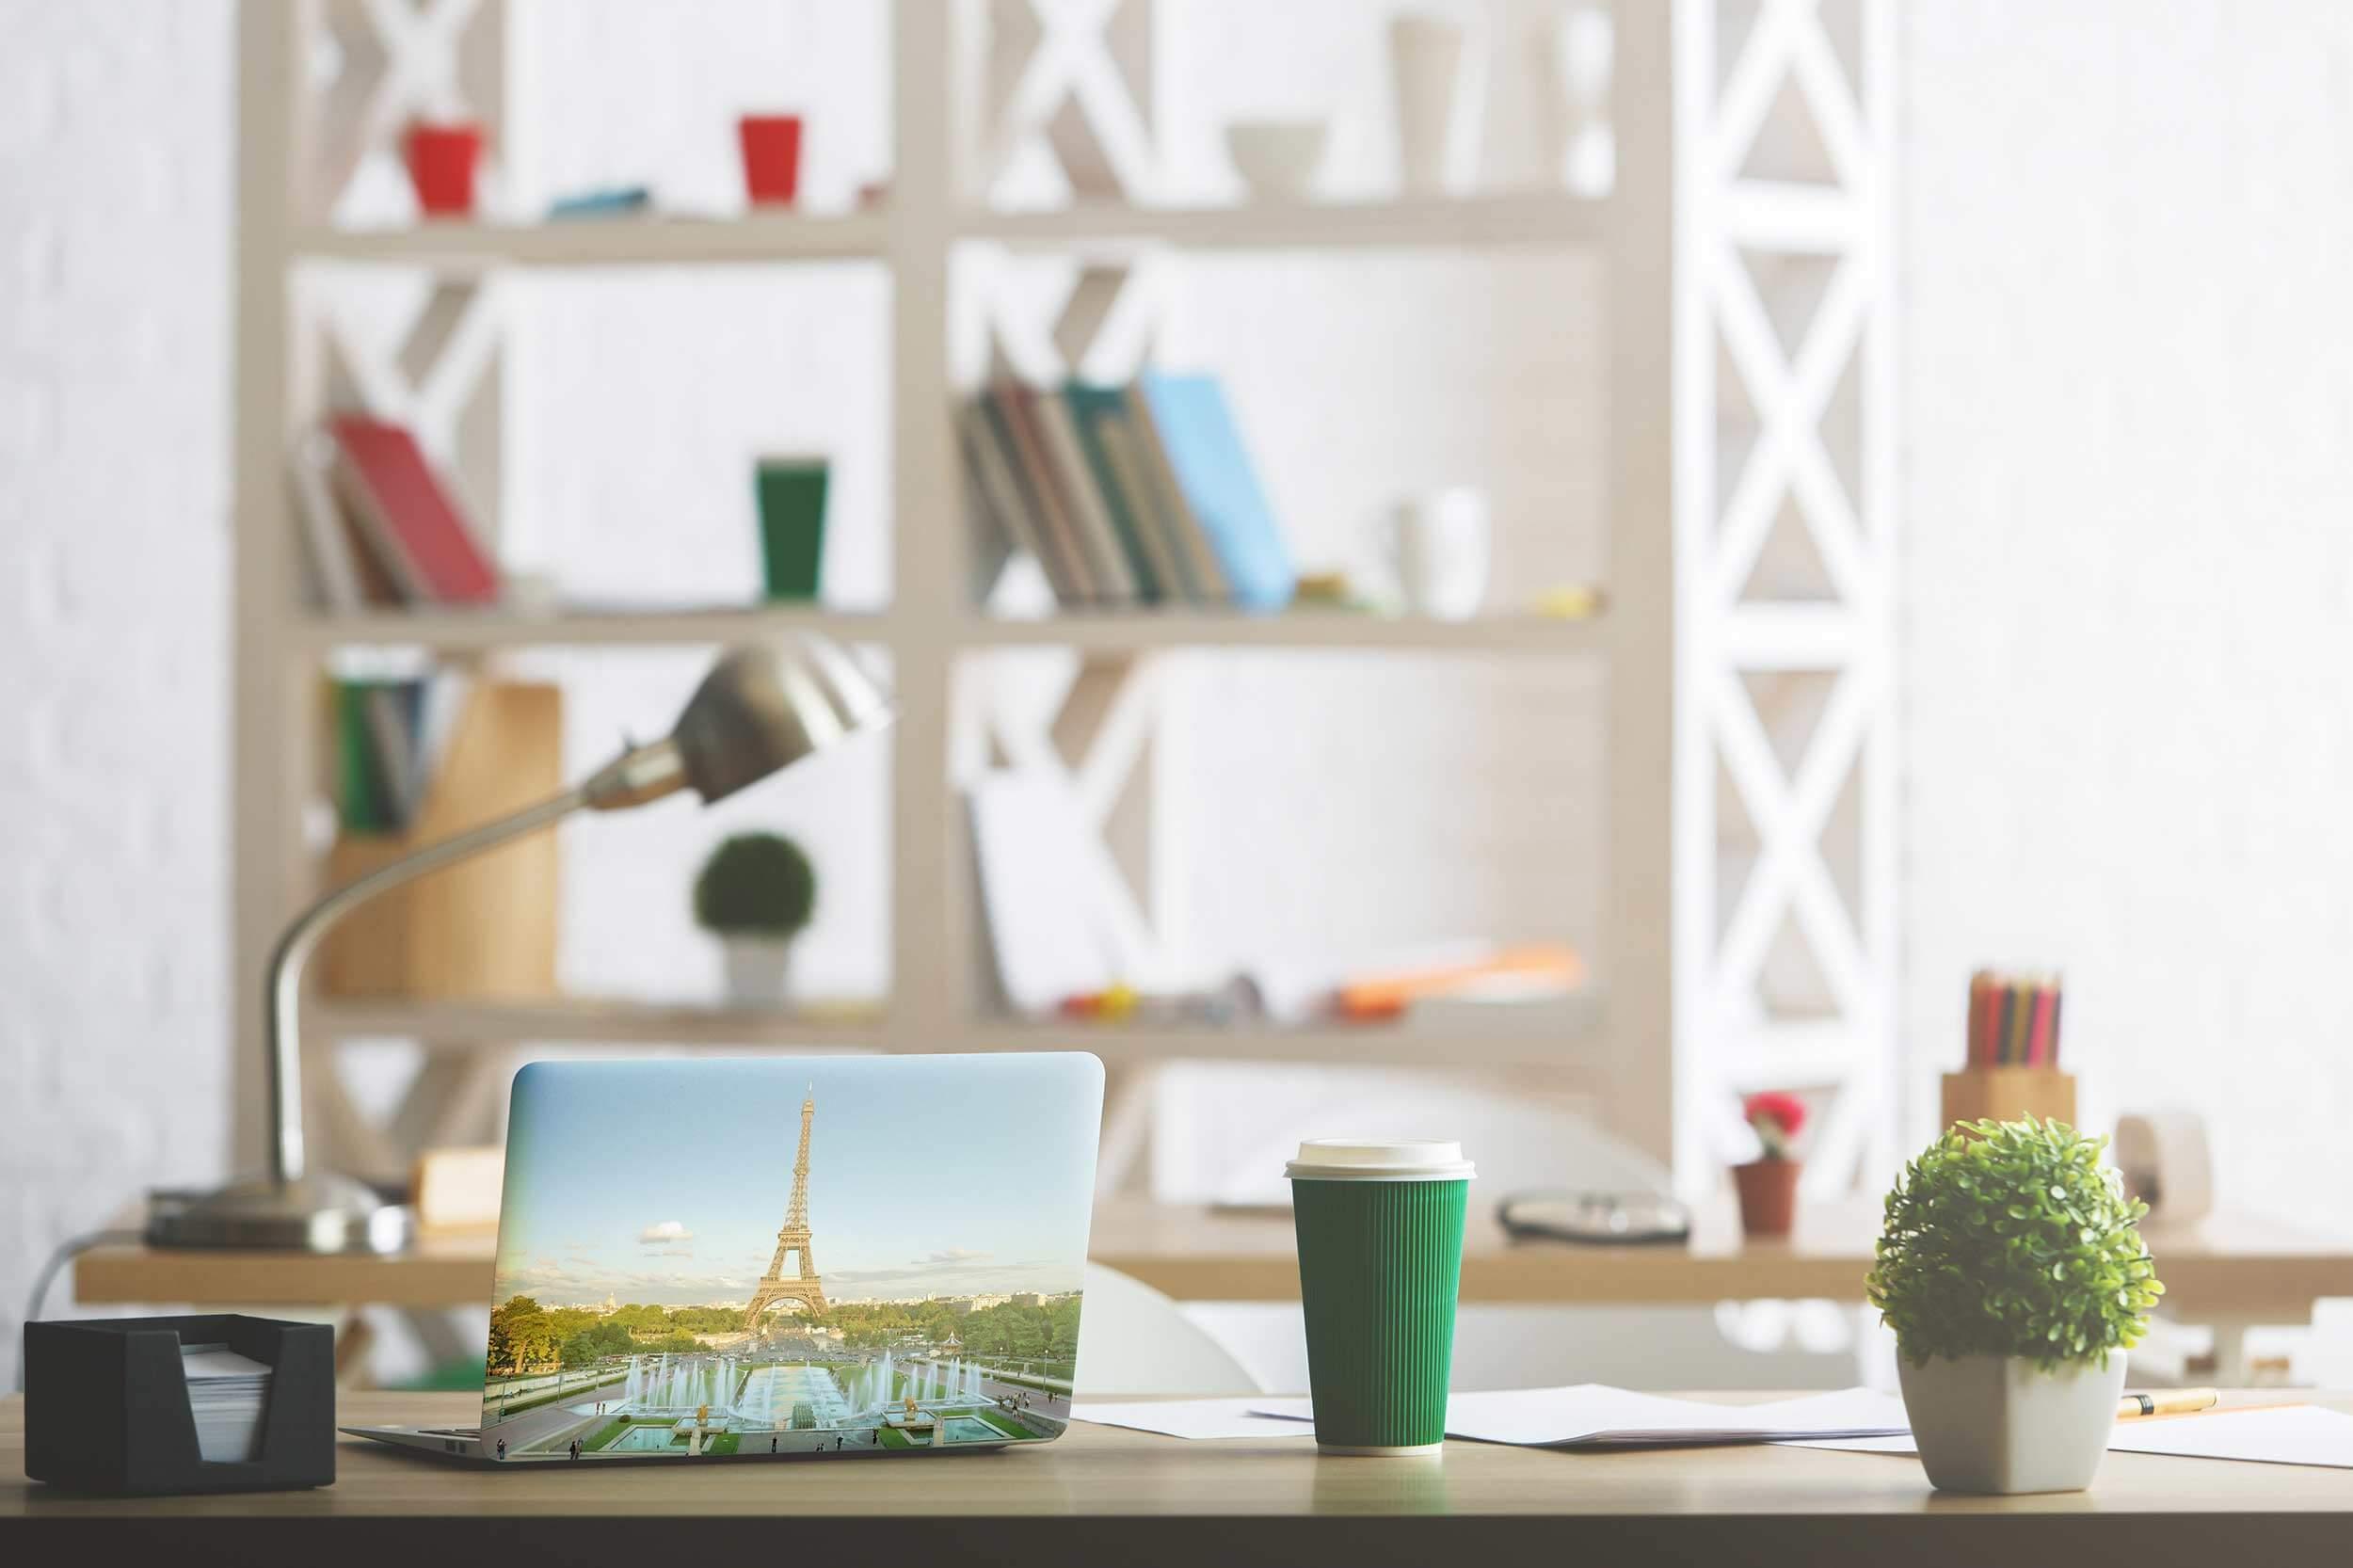 Vinilo Adhesivo para PC Portátil Torre Eiffel | Carteles XXL - Impresión carteleria publicitaria